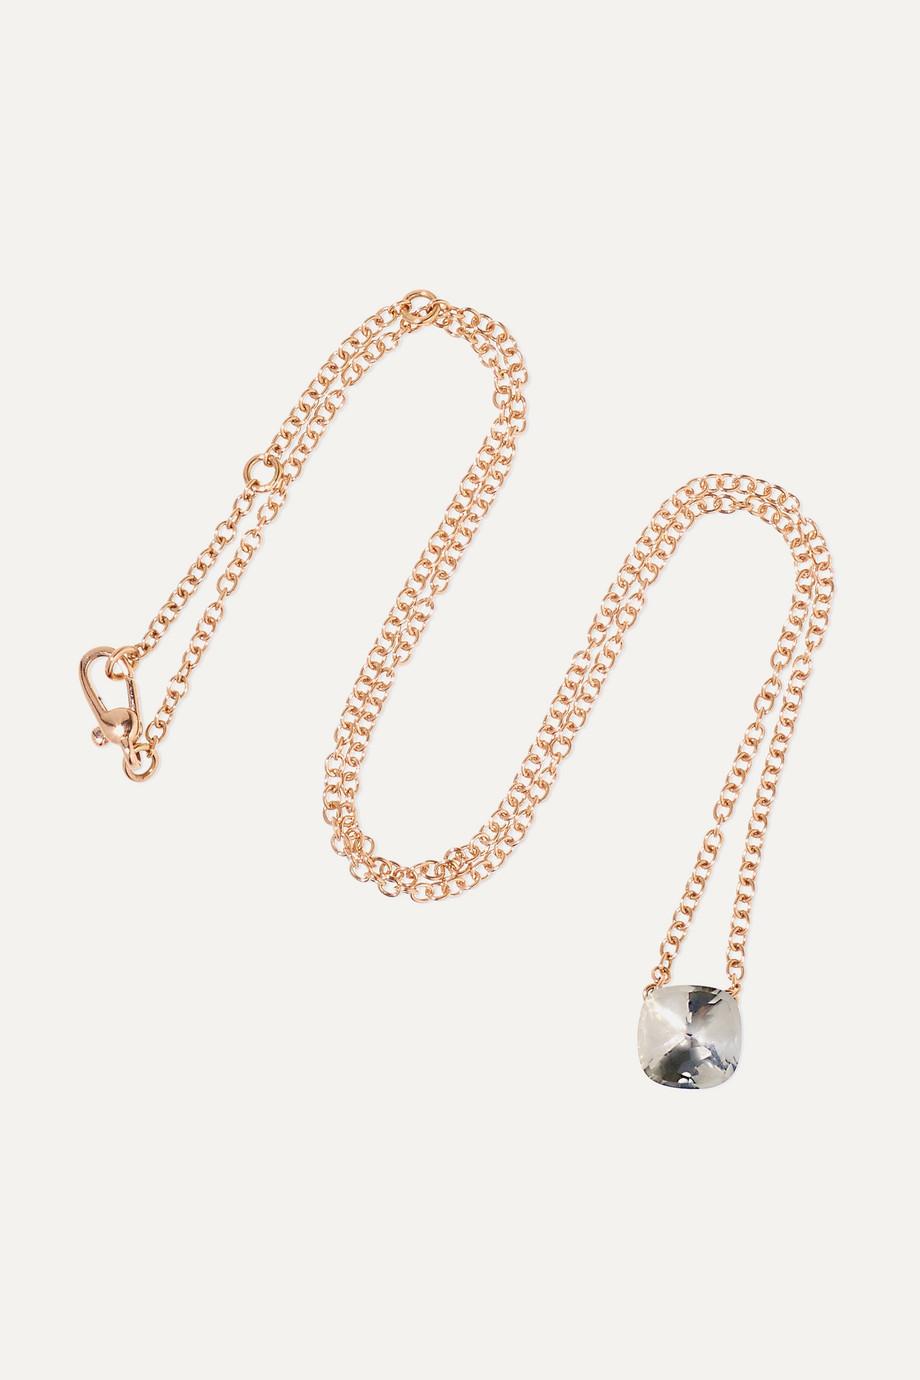 Pomellato Nudo 18-karat rose and white gold topaz necklace